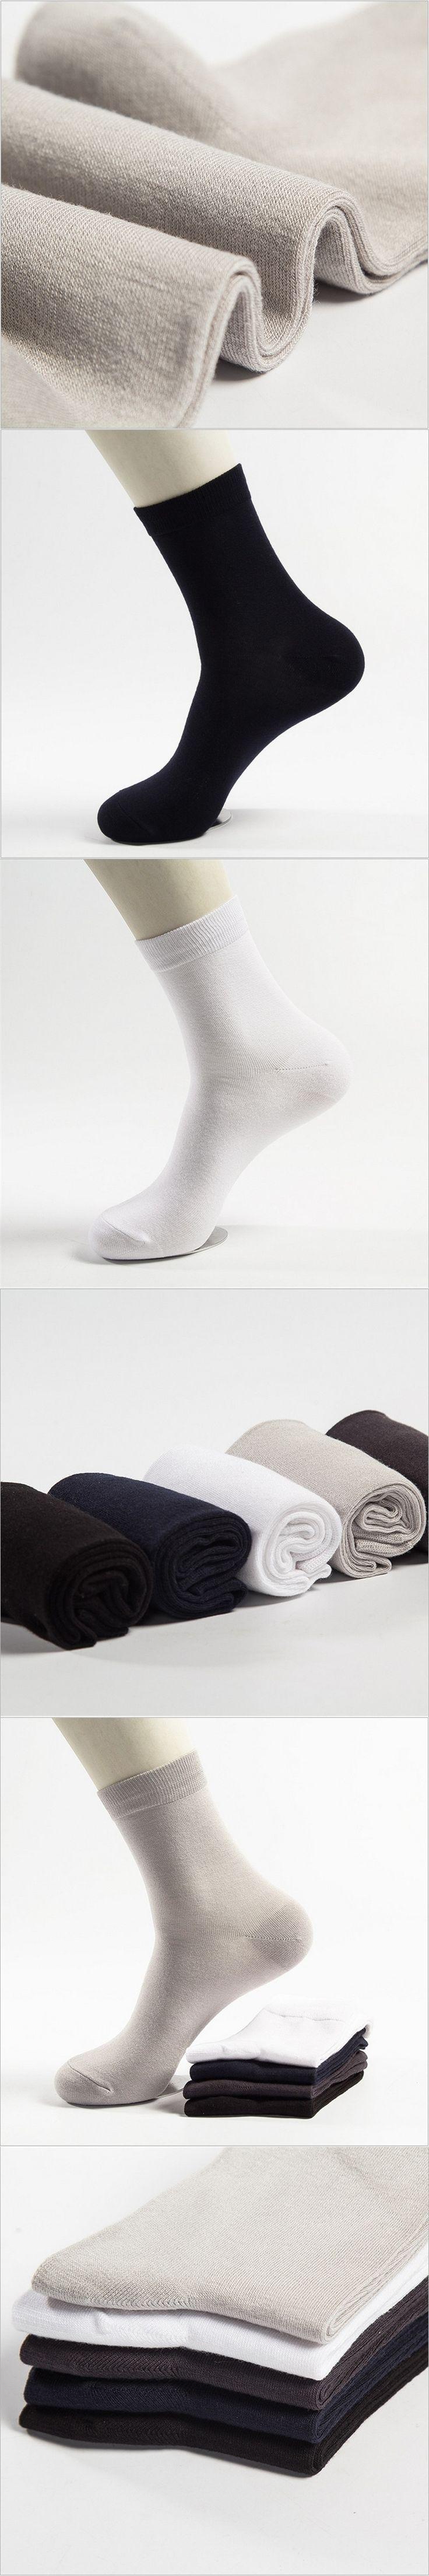 Men'socks for sneakers 2017 new year dresses winter wear  high quality bamboo socks warm happy meja compression socks